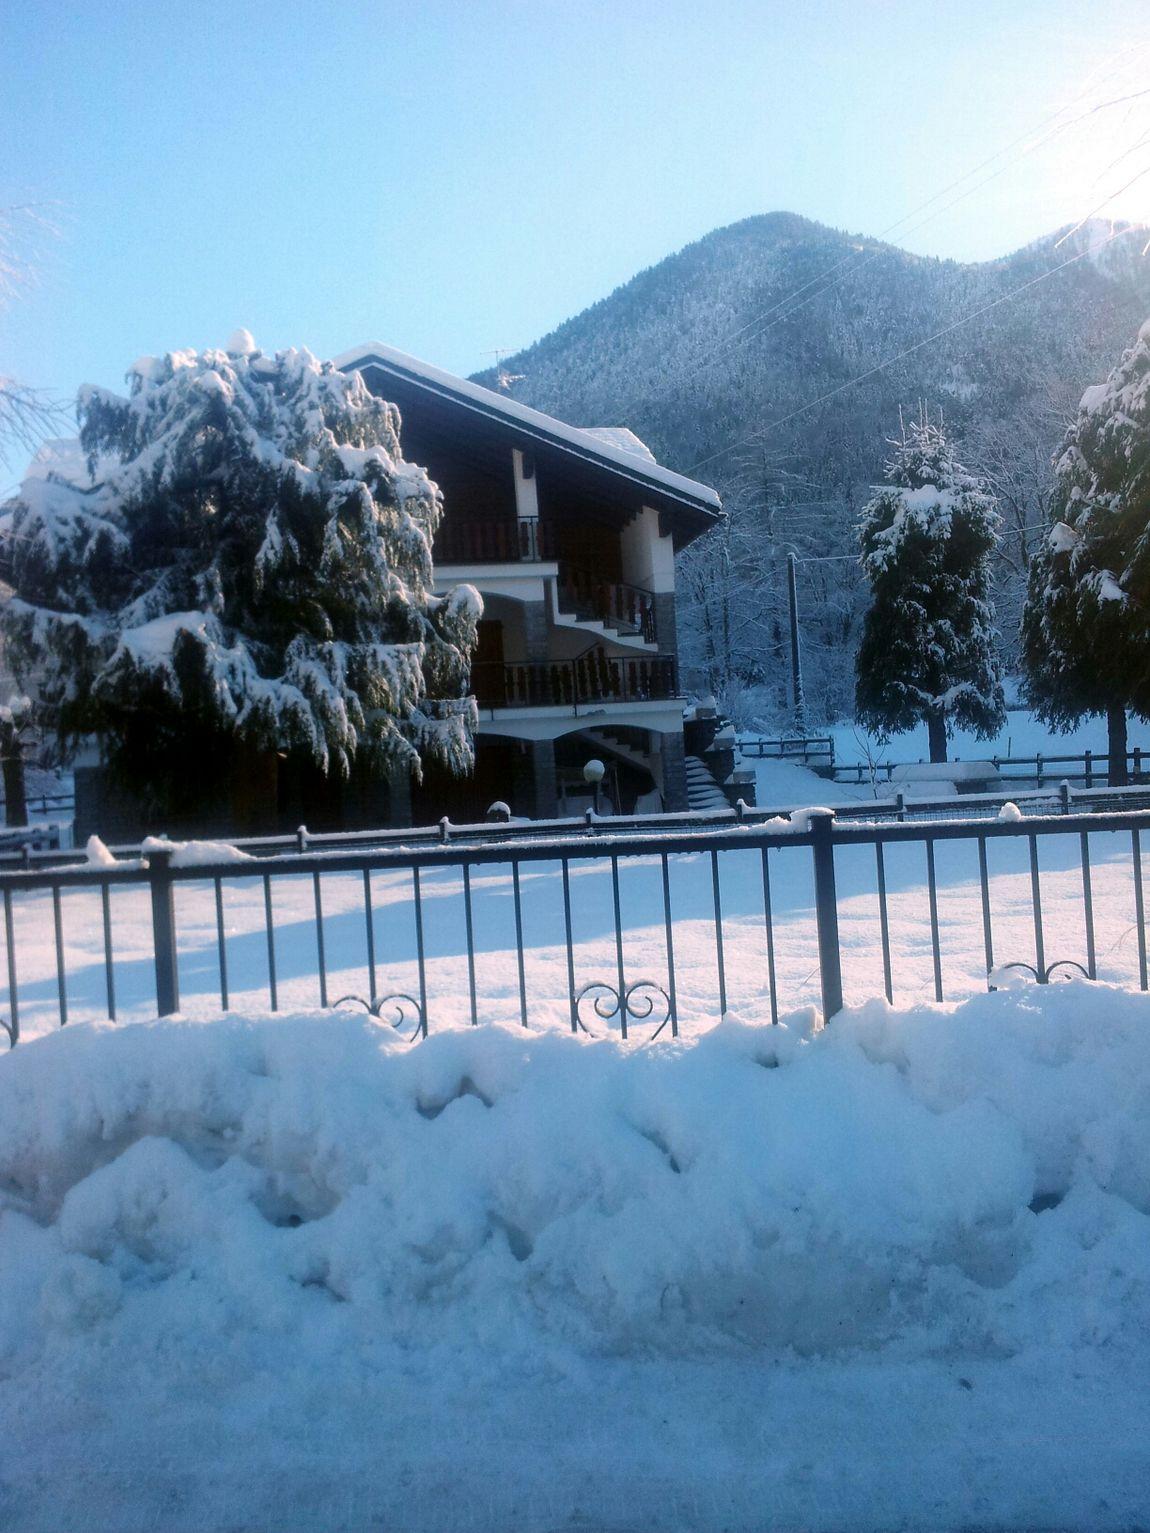 Snow Tree Winter Winter White By CanvasPop